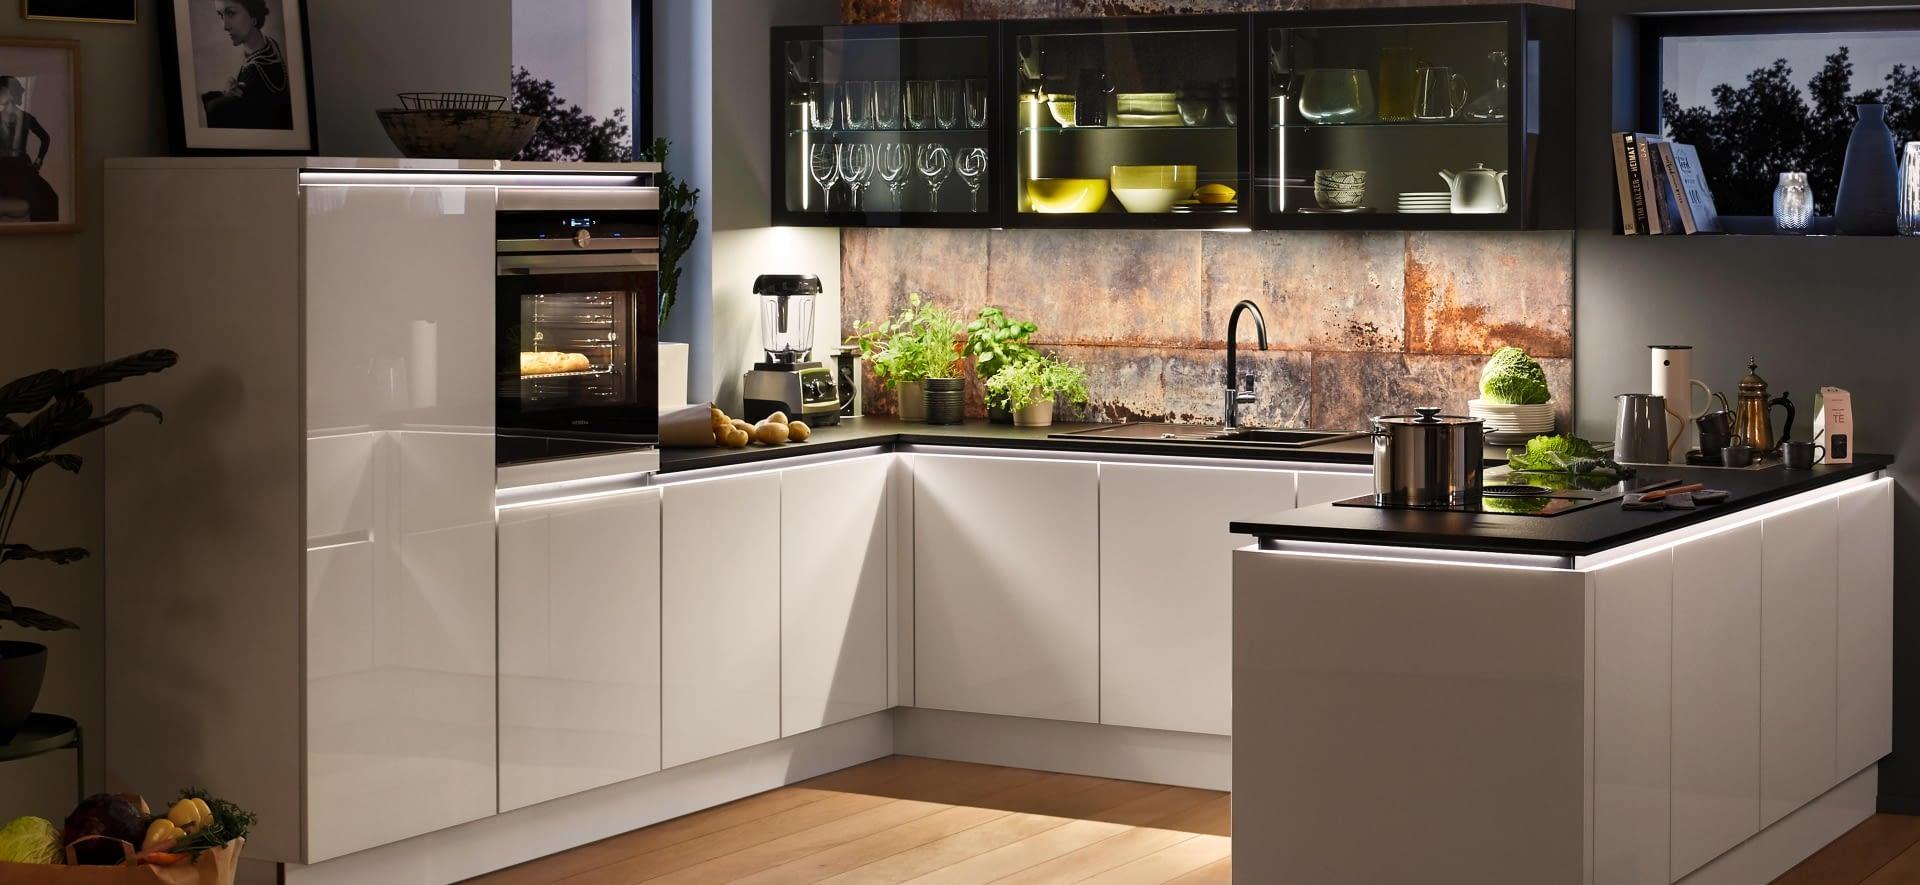 Full Size of Alternative Küchen Regal Sofa Alternatives Wohnzimmer Alternative Küchen